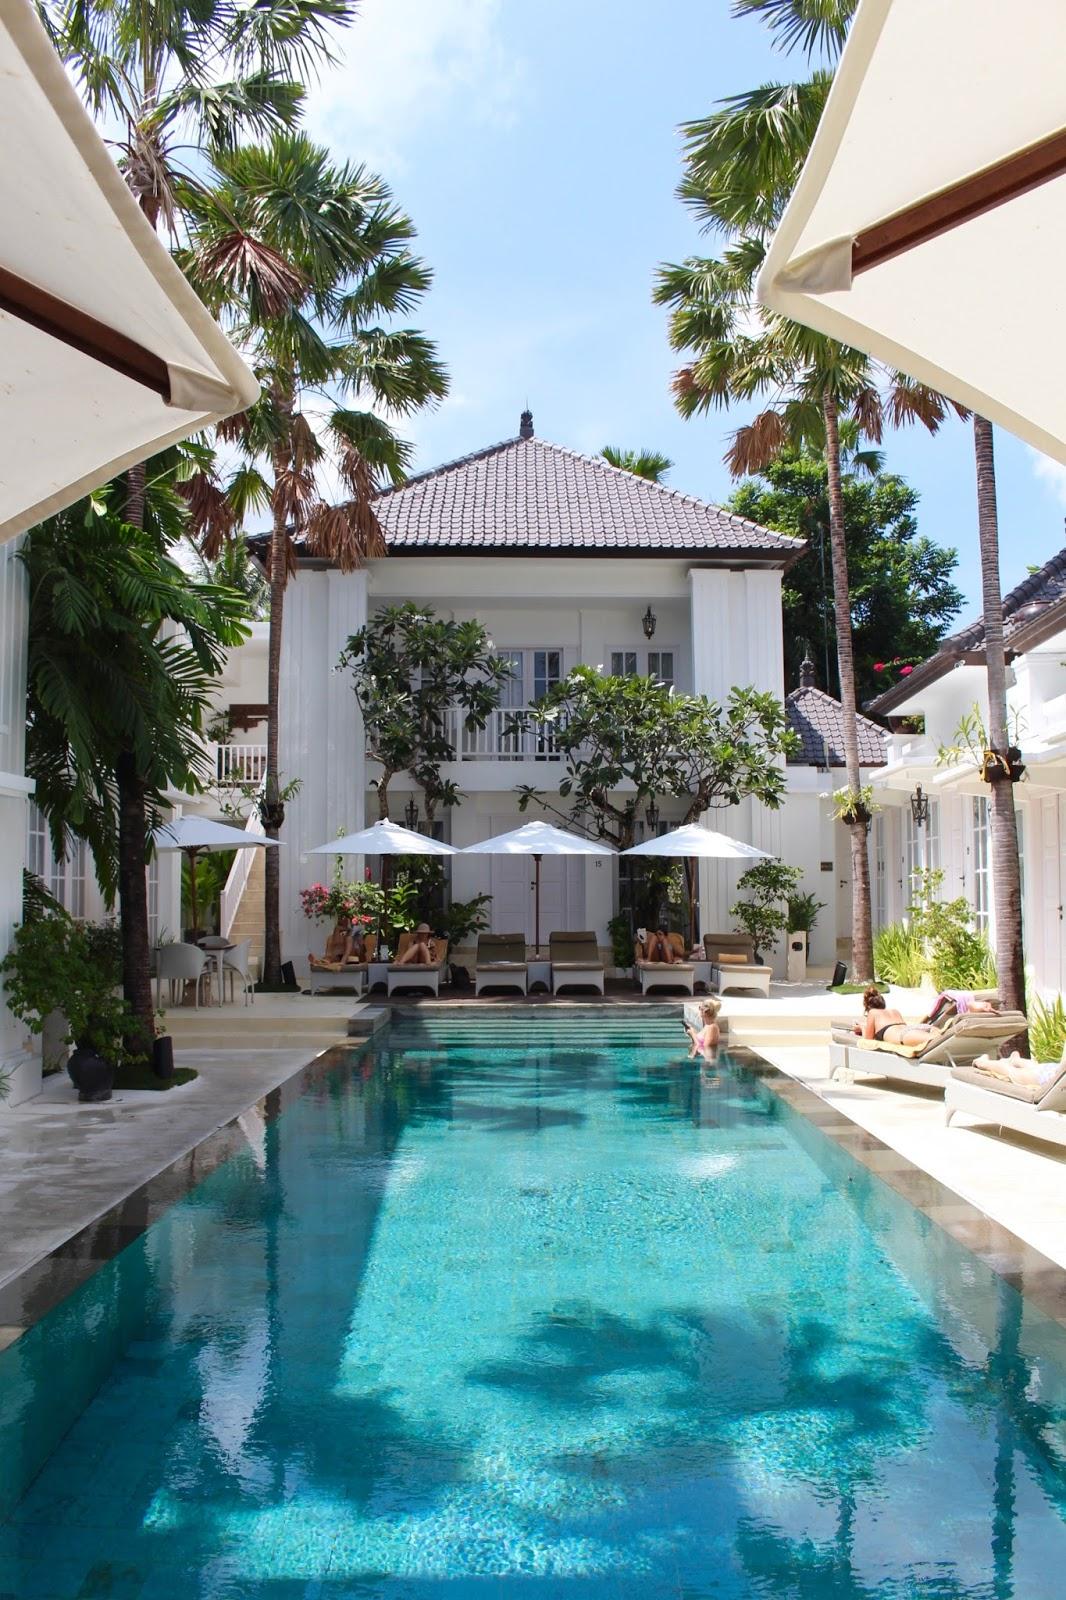 Where to stay in Bali | Ubud, Seminyak & Uluwatu